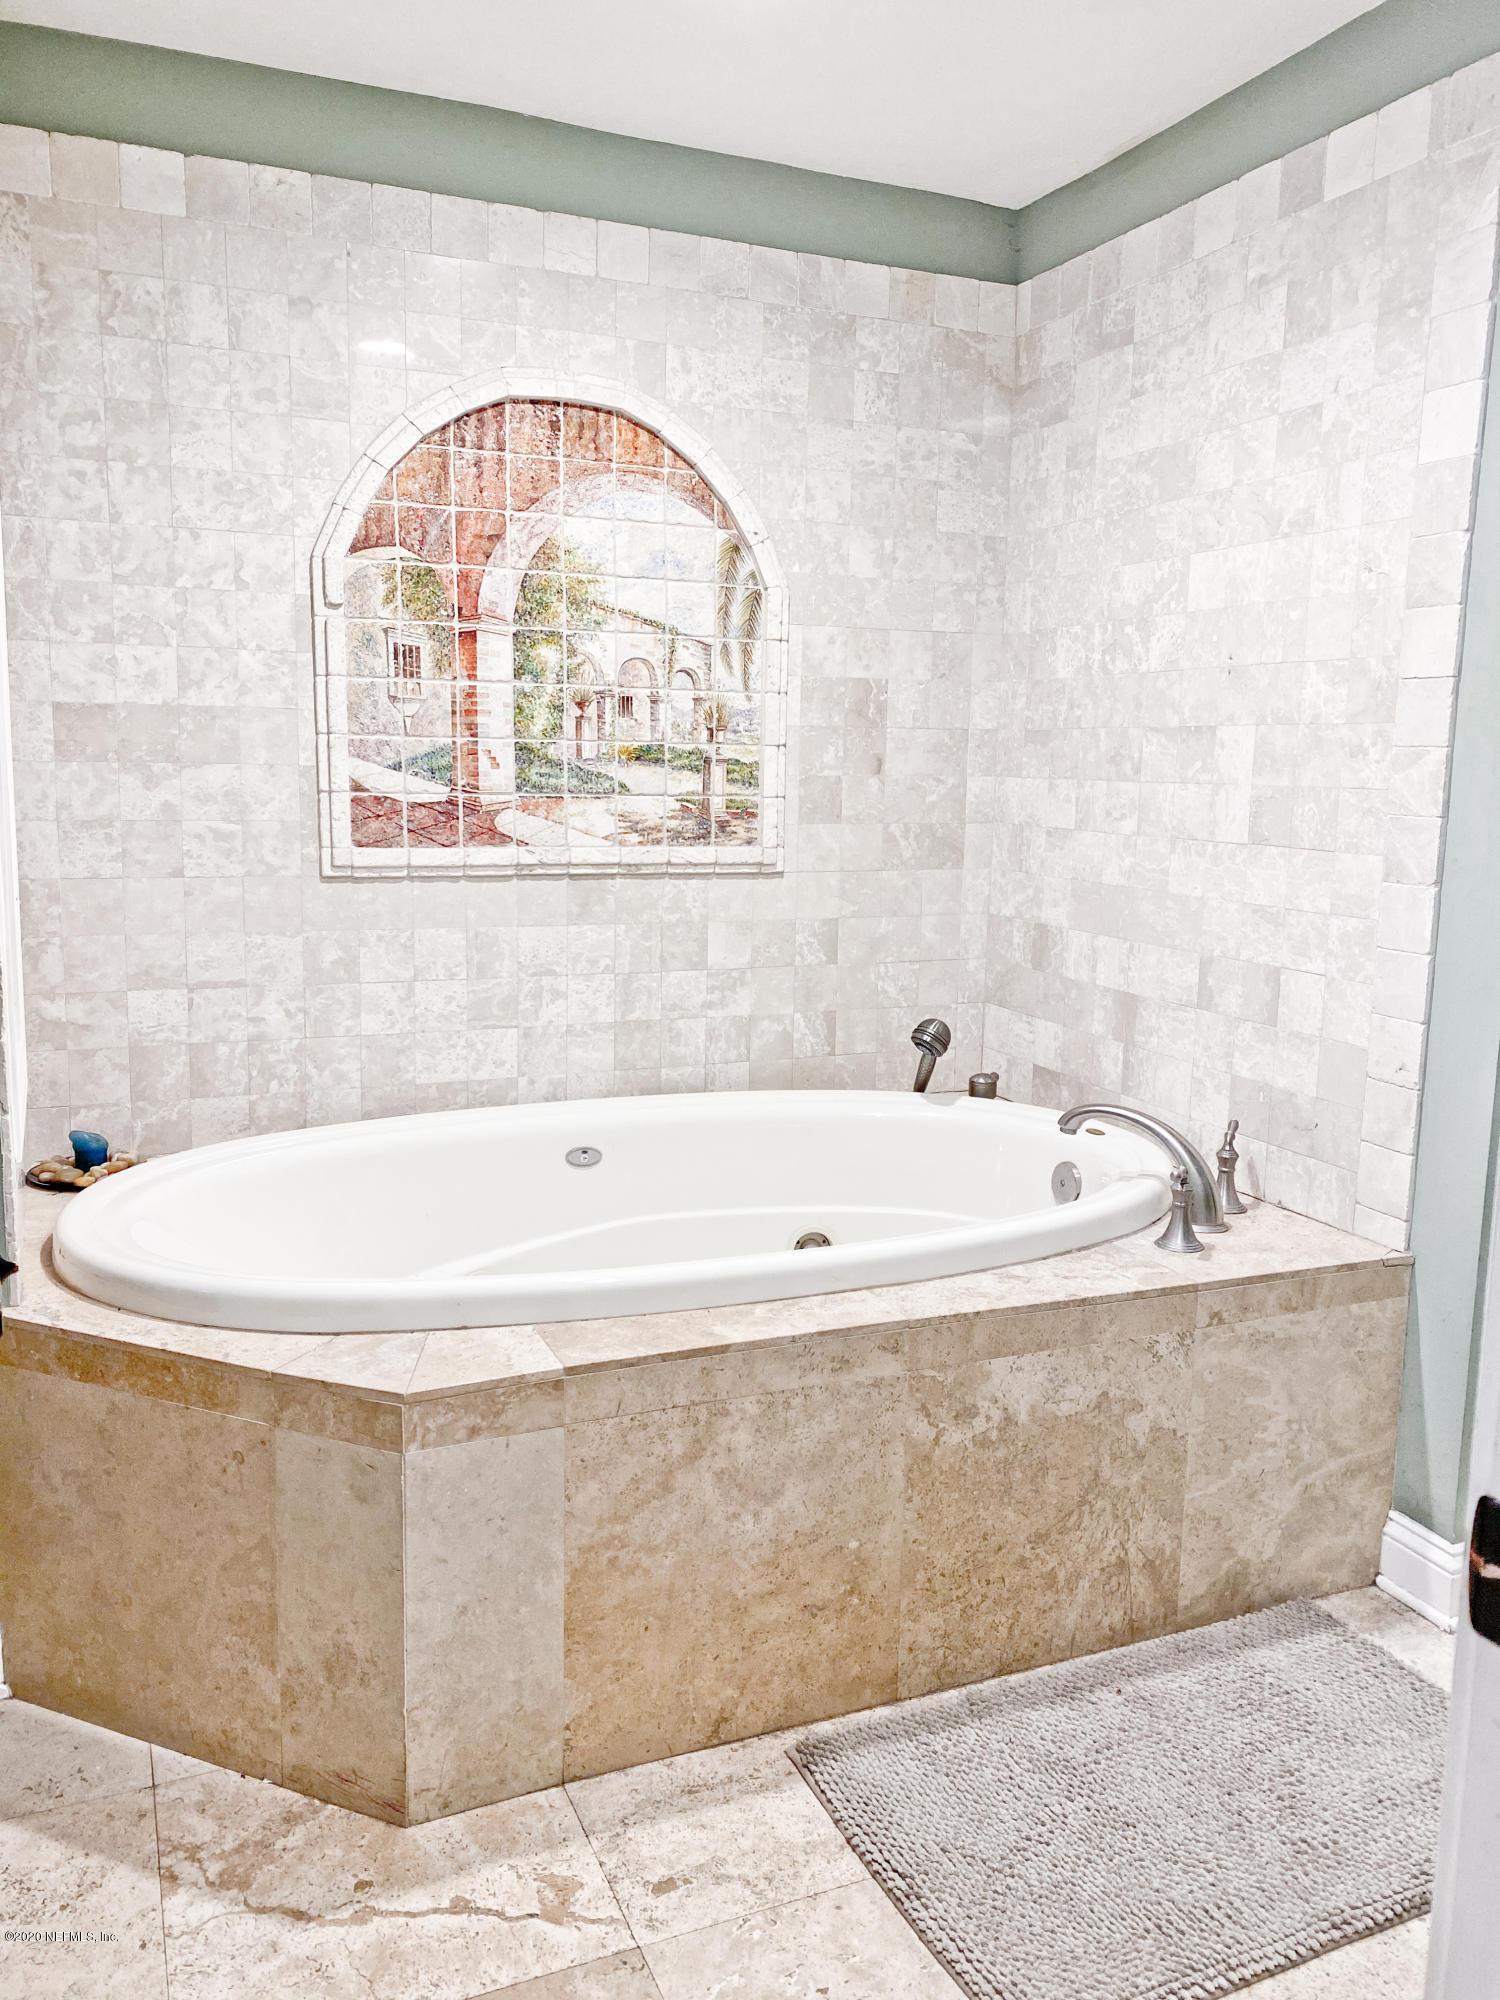 4831 MARSH HAMMOCK, JACKSONVILLE, FLORIDA 32224, 3 Bedrooms Bedrooms, ,3 BathroomsBathrooms,Residential,For sale,MARSH HAMMOCK,1082175